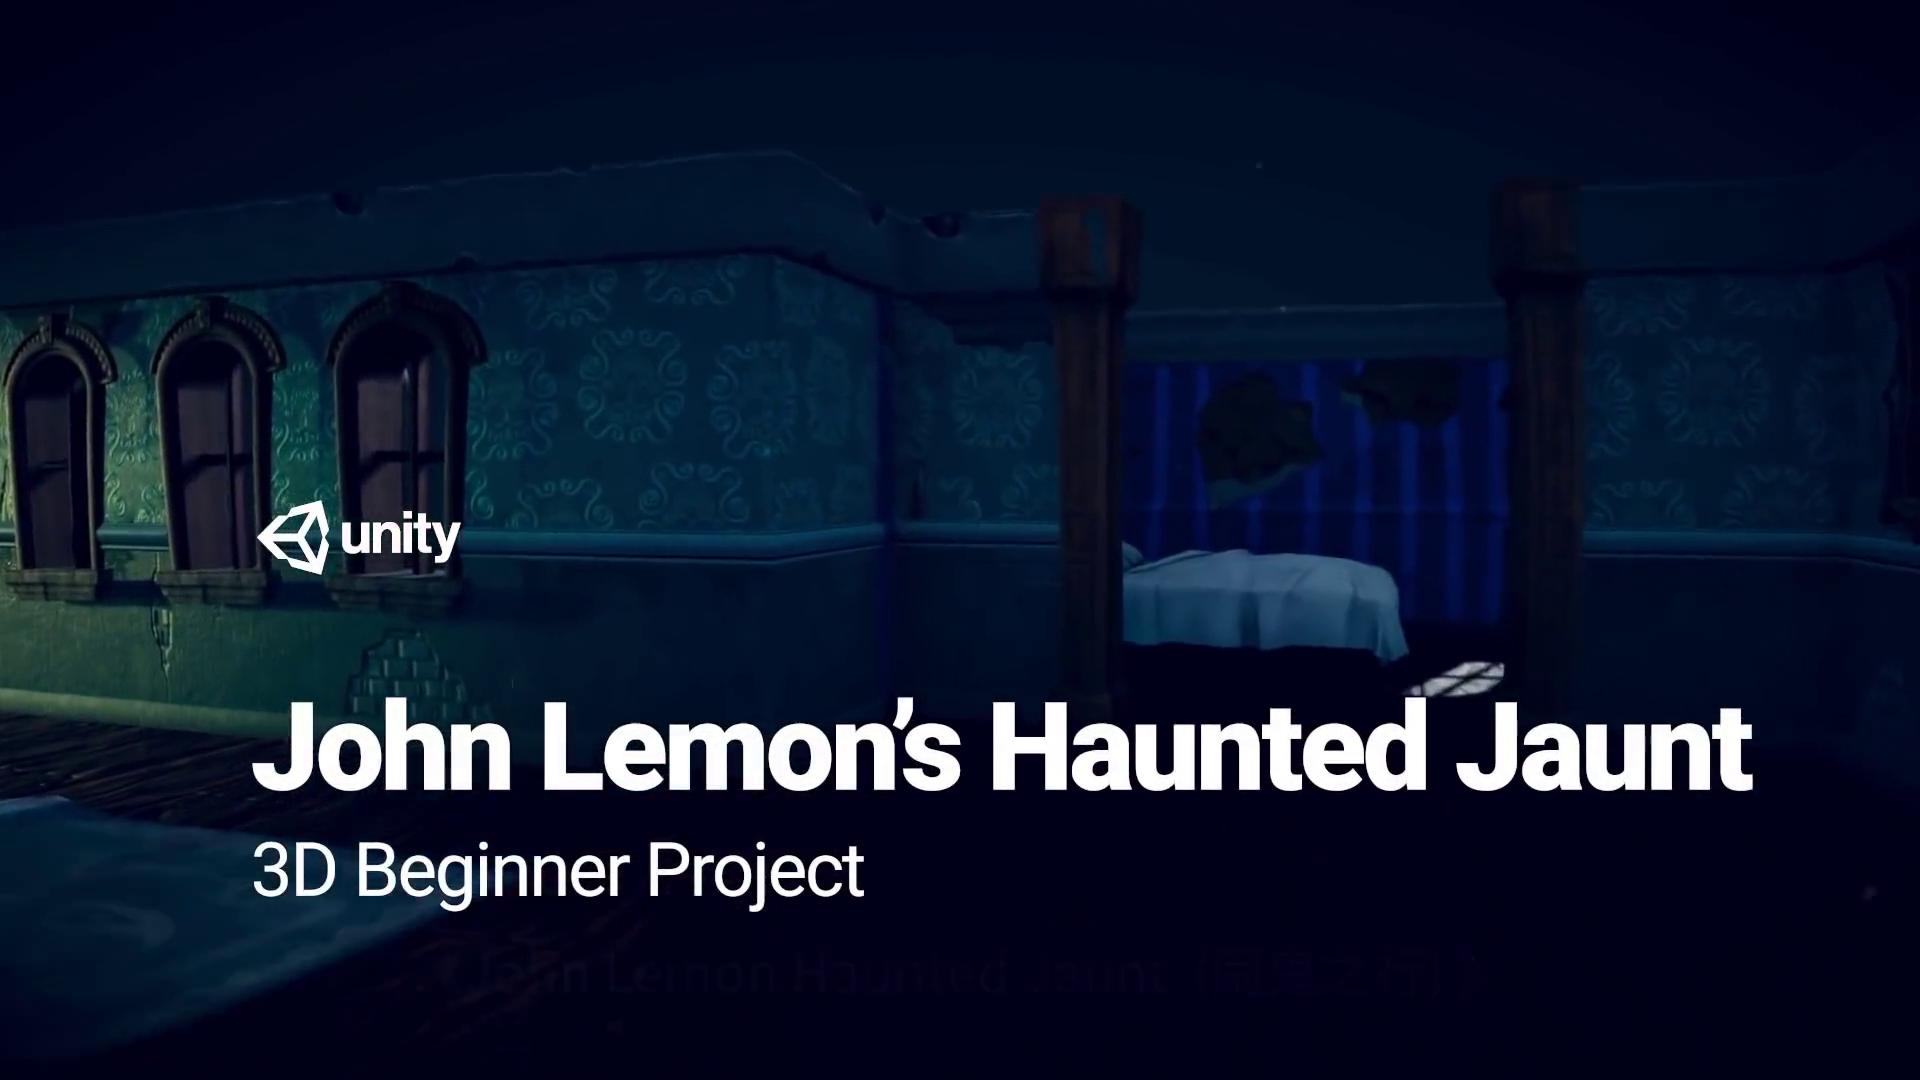 Unity3D游戏初学者教程《John Lemon's Haunted Jaunt》